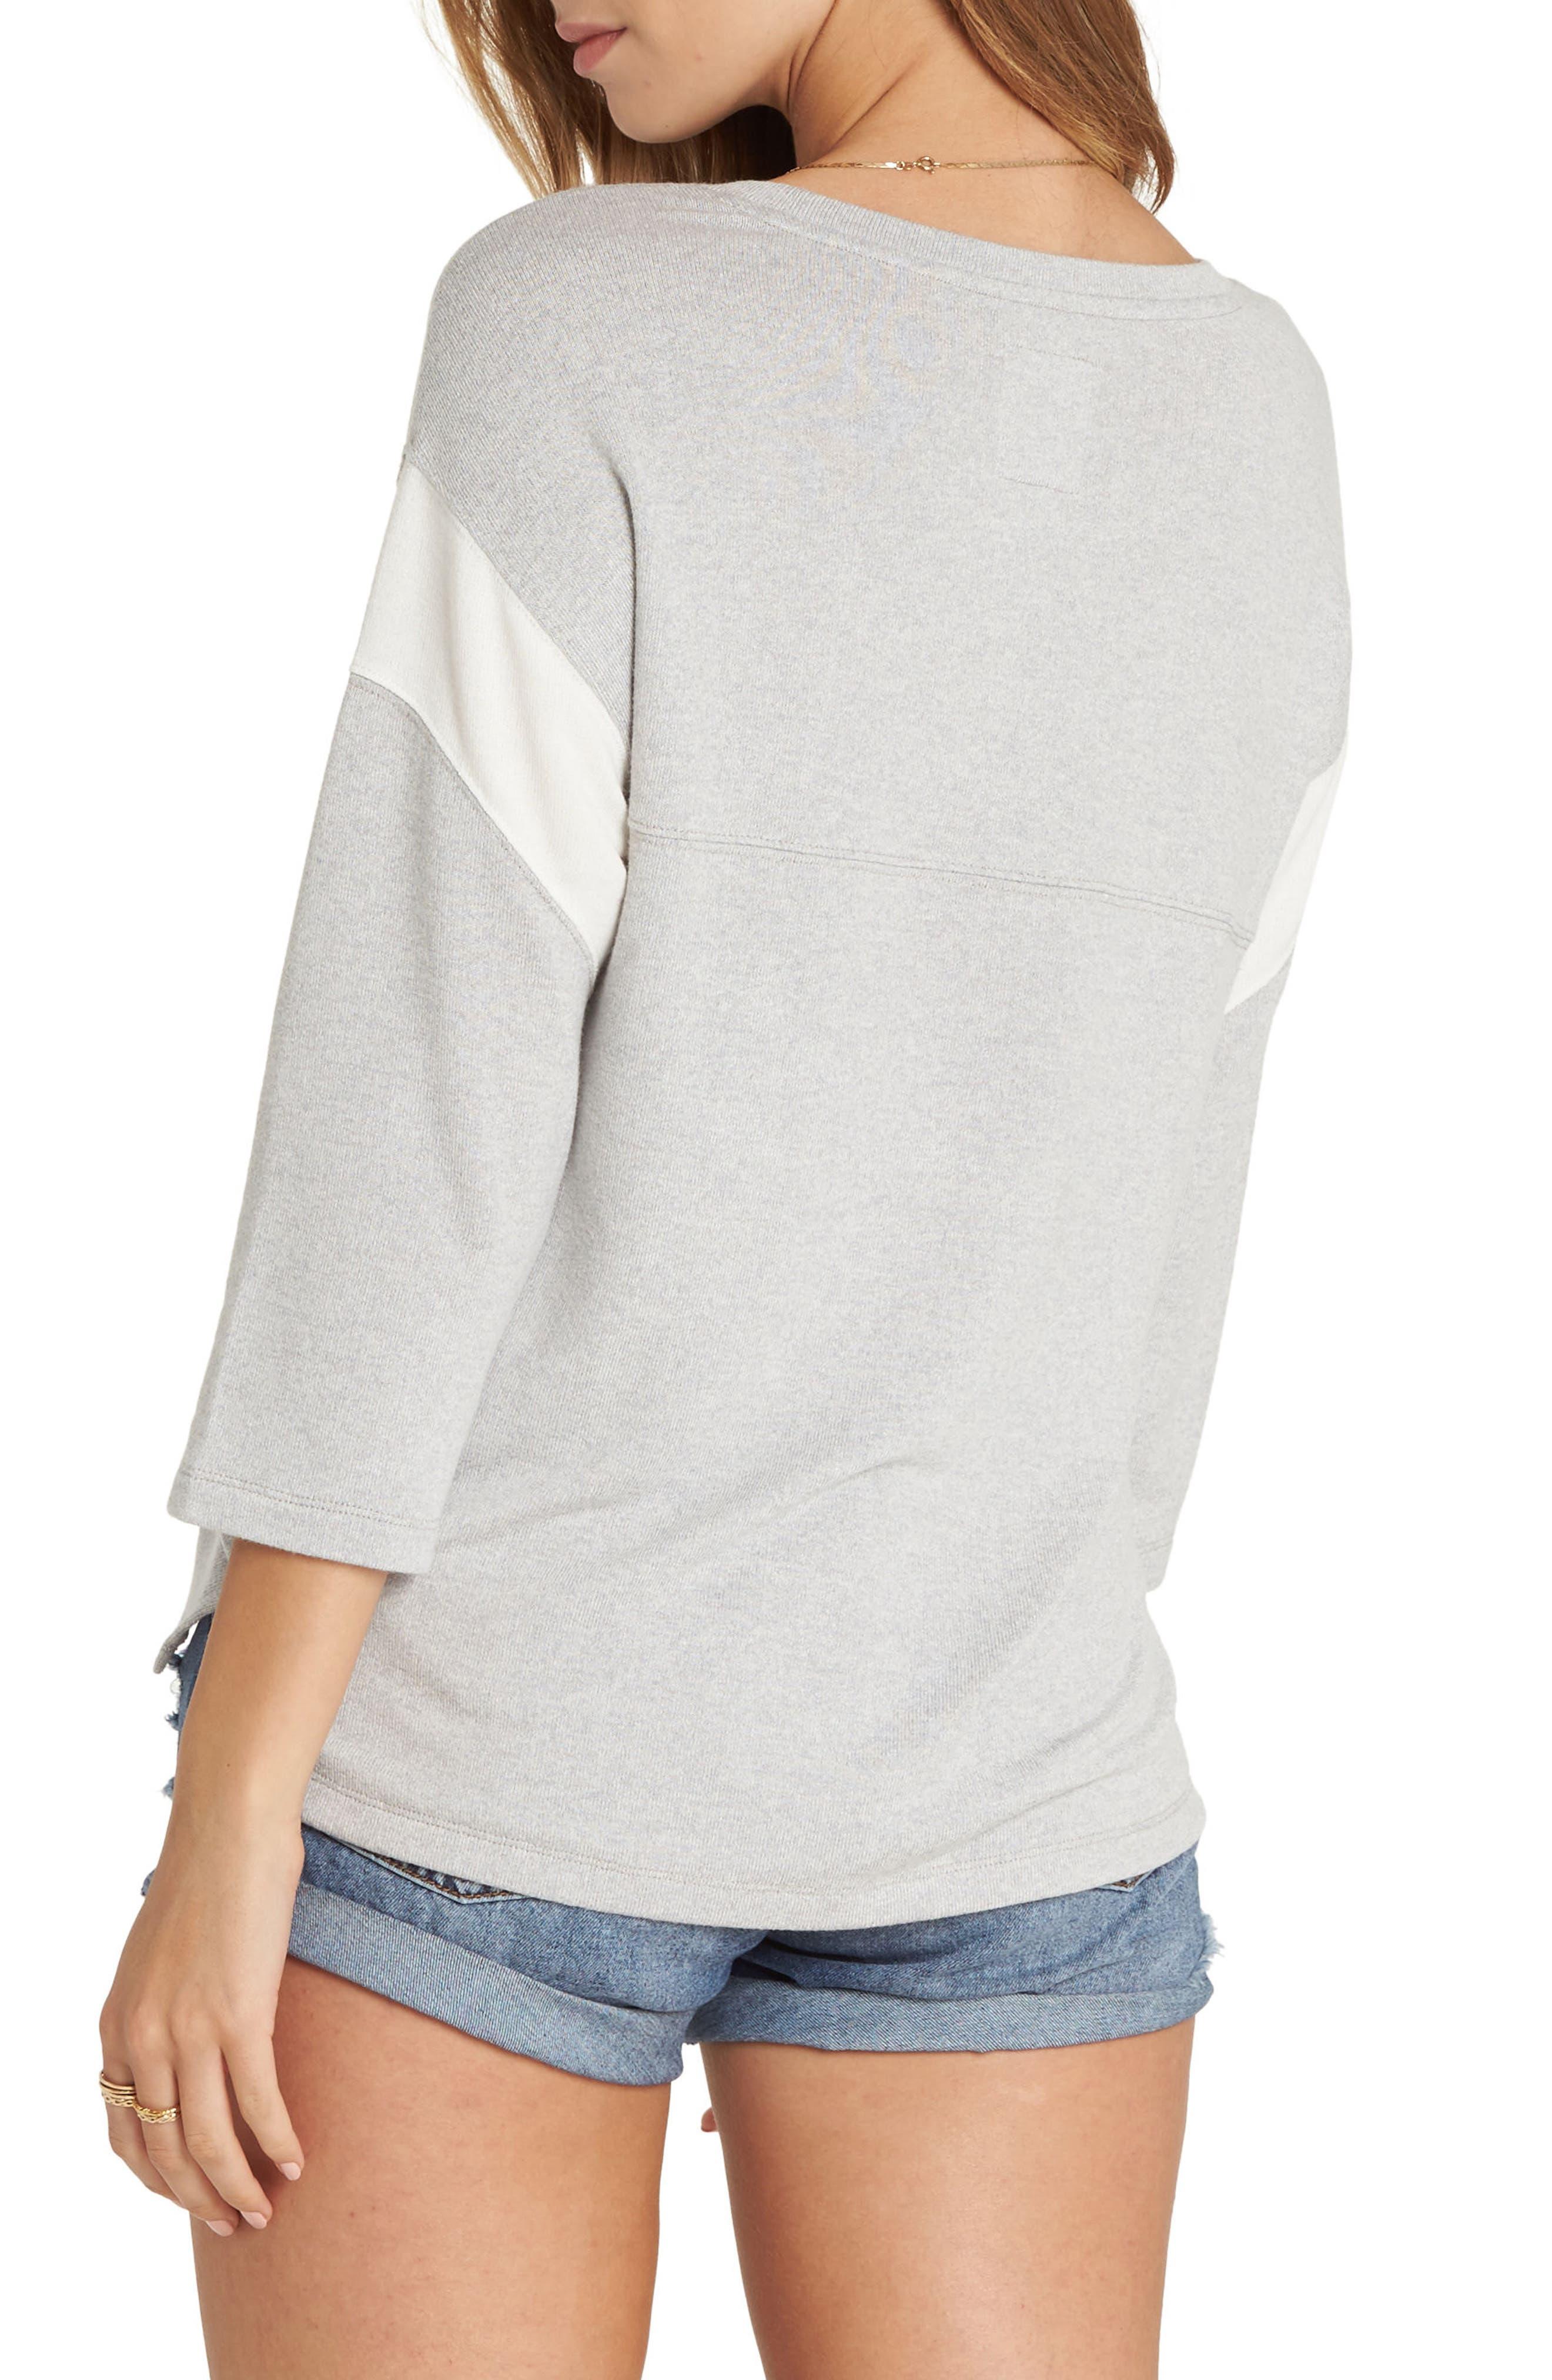 Kicking Game Sweatshirt,                             Alternate thumbnail 2, color,                             Ice Athletic Grey